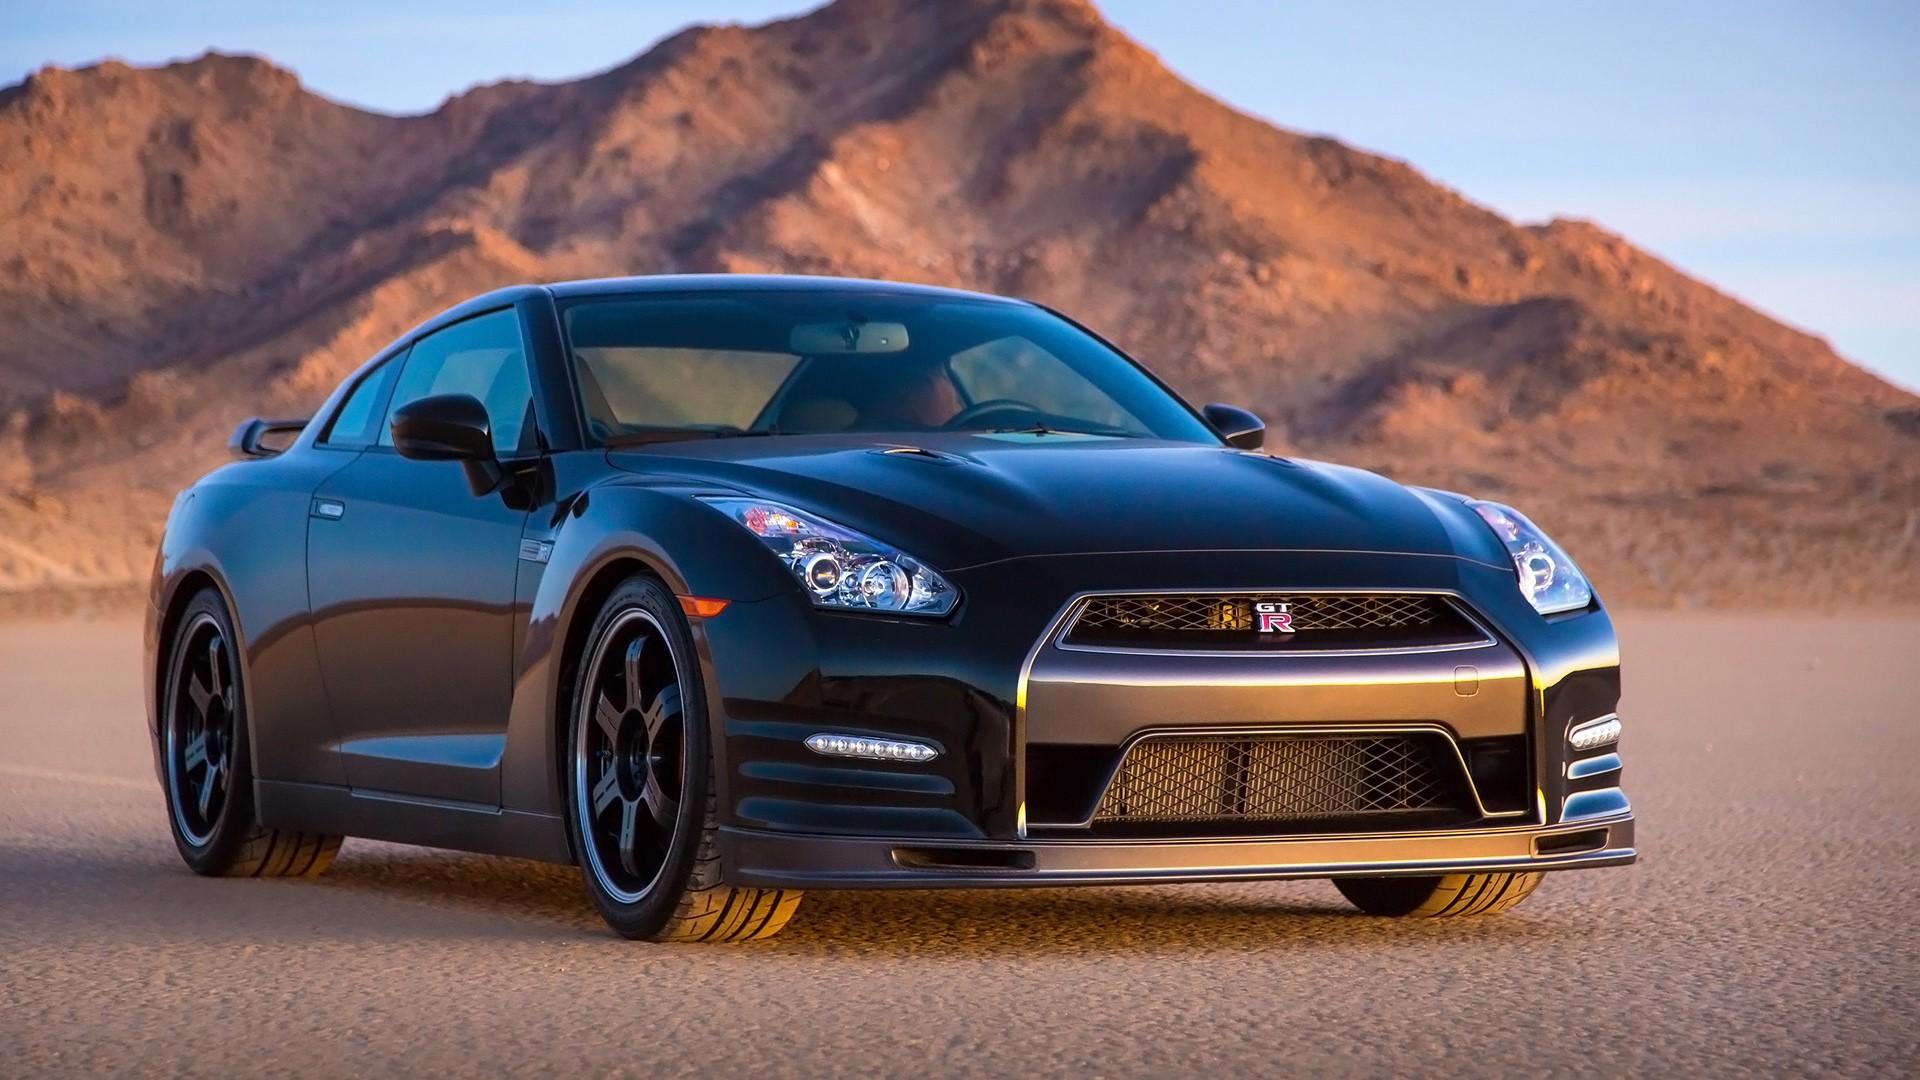 Nissan GT R Track Edition 2014 Wallpaper | HD Car ...